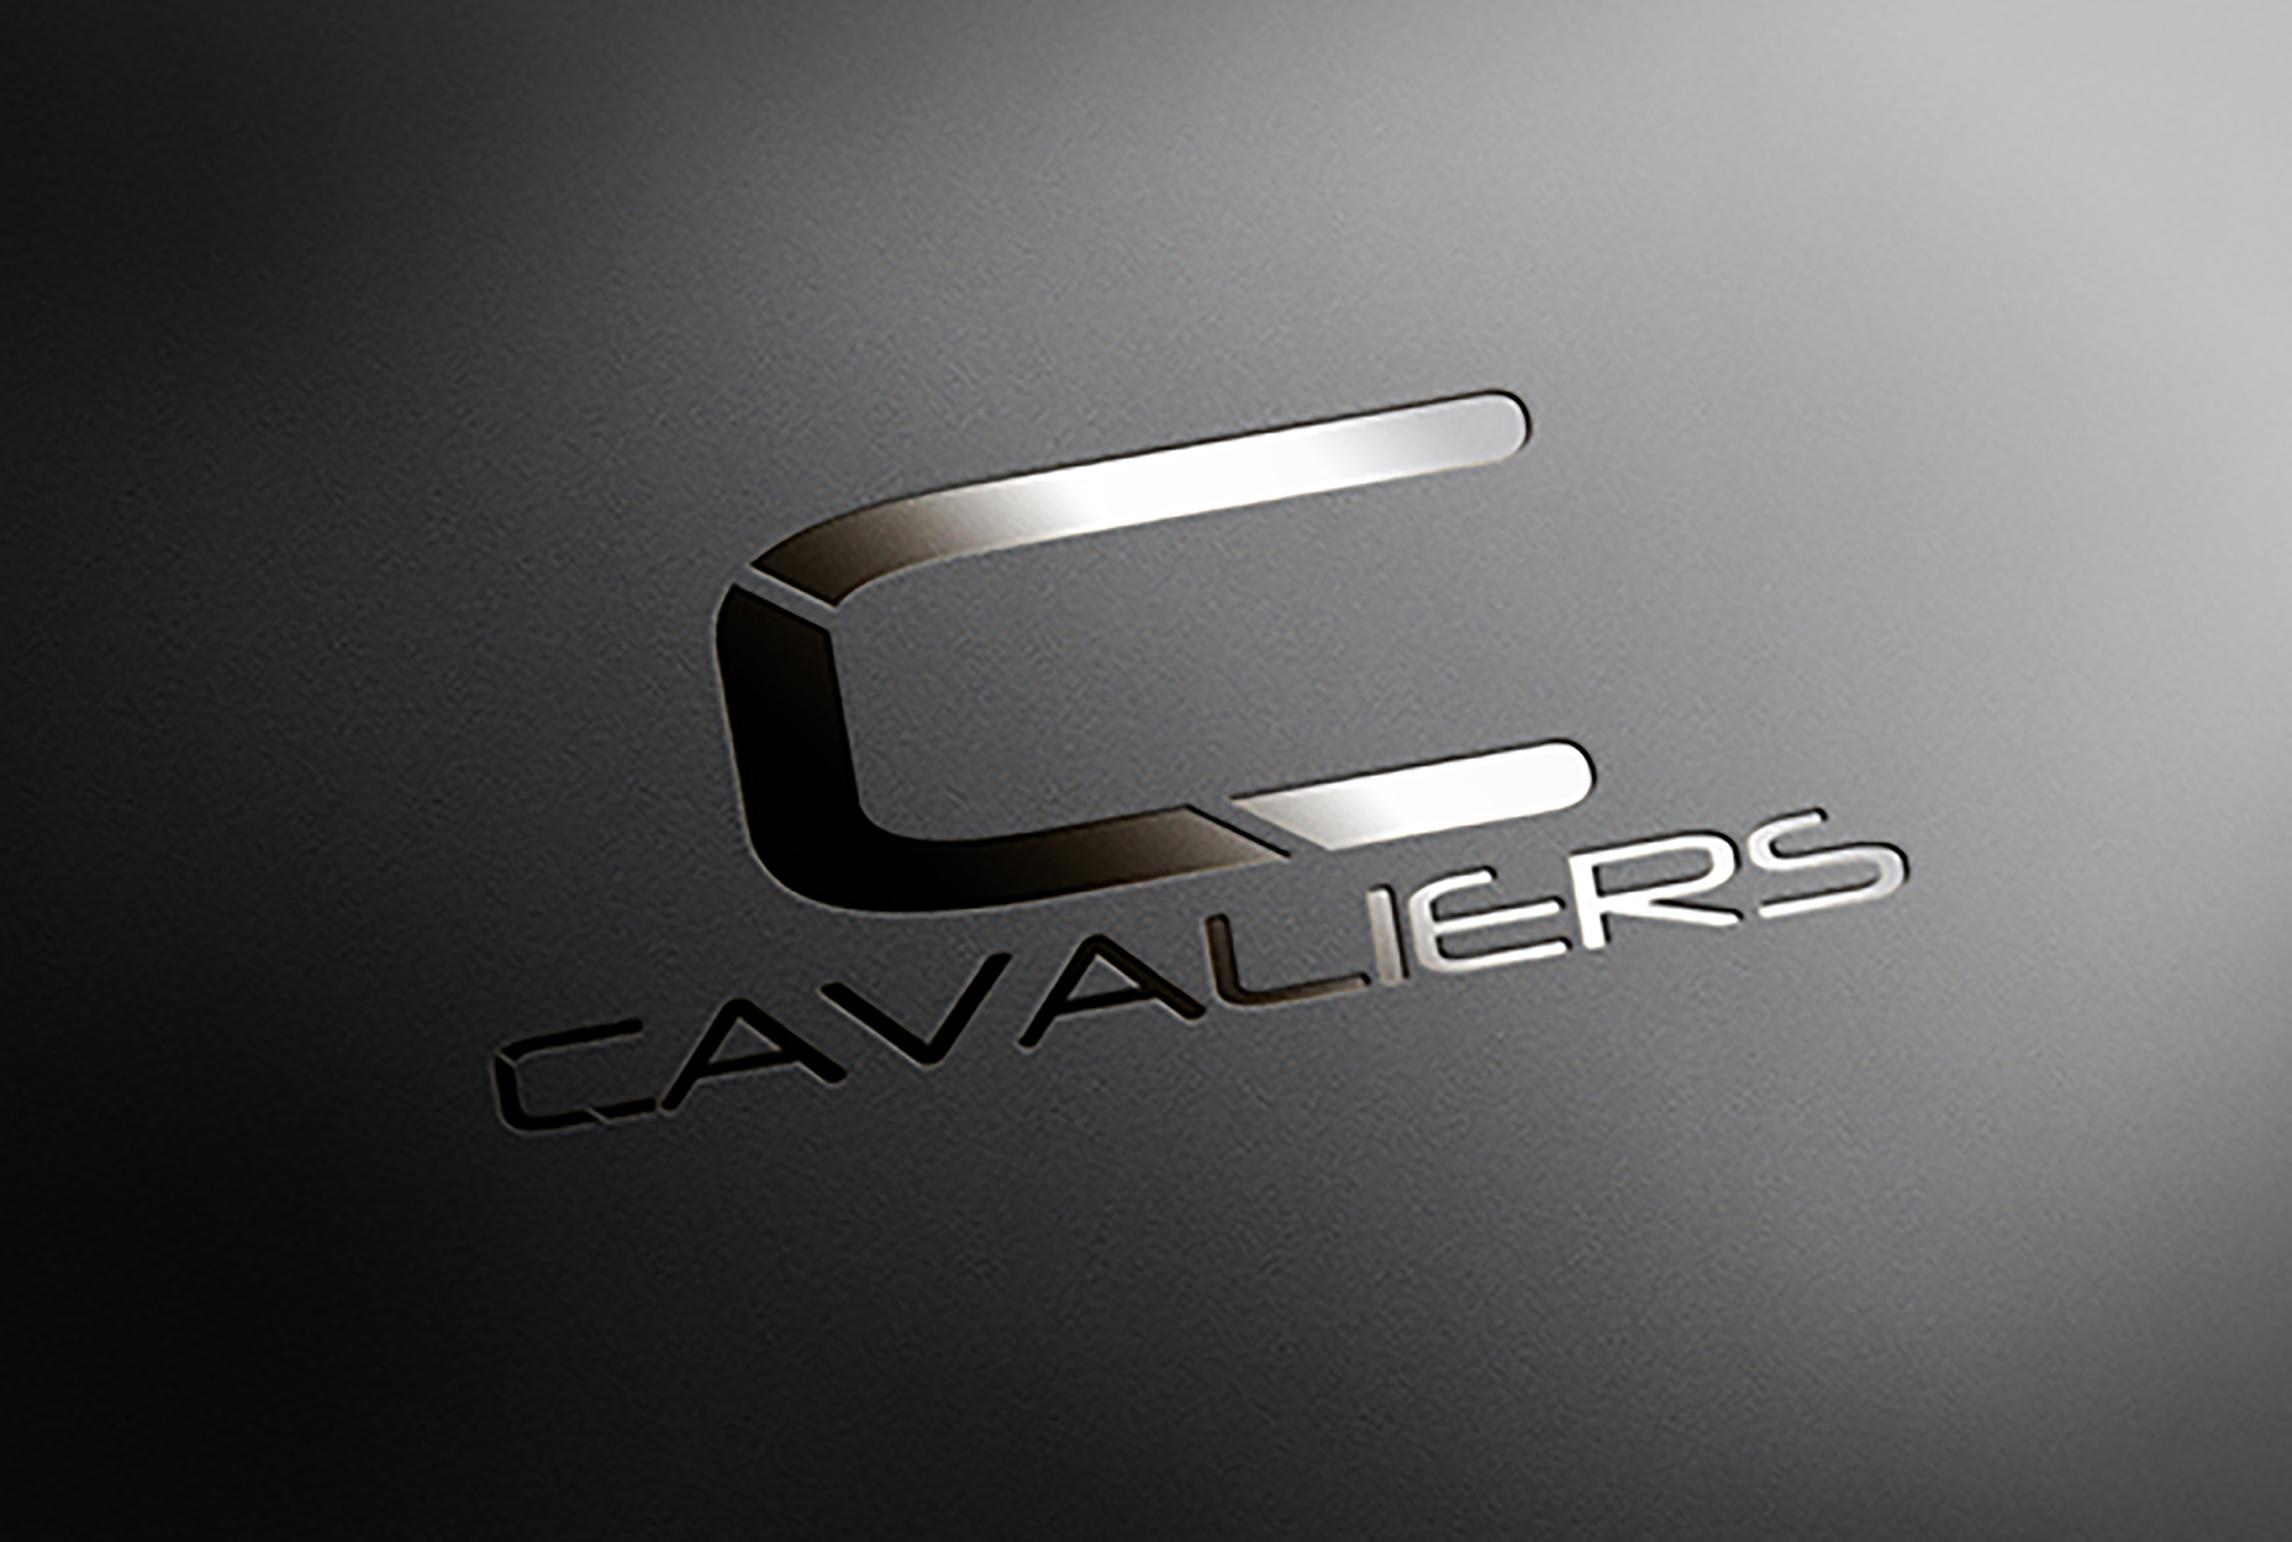 I will craft a professional modern, clean, minimalist business logo